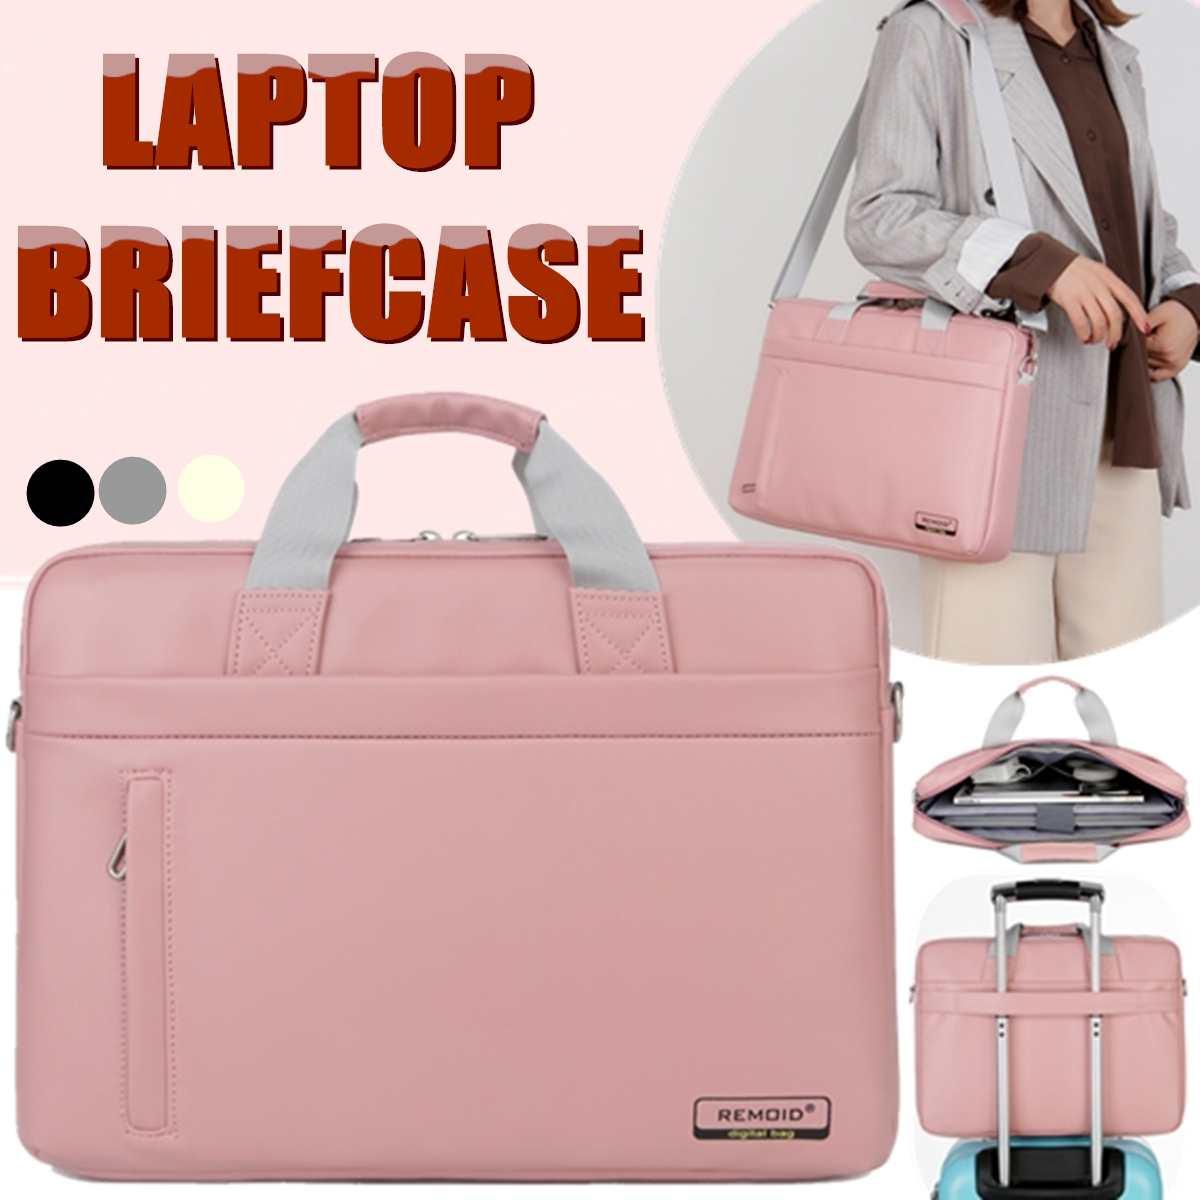 Osmond Women PU Laptop Bag 15.6 Inch Notebook Carrying Case Briefcase For Macbook Air Men Waterproof Handbags Shoulder Bag Pink